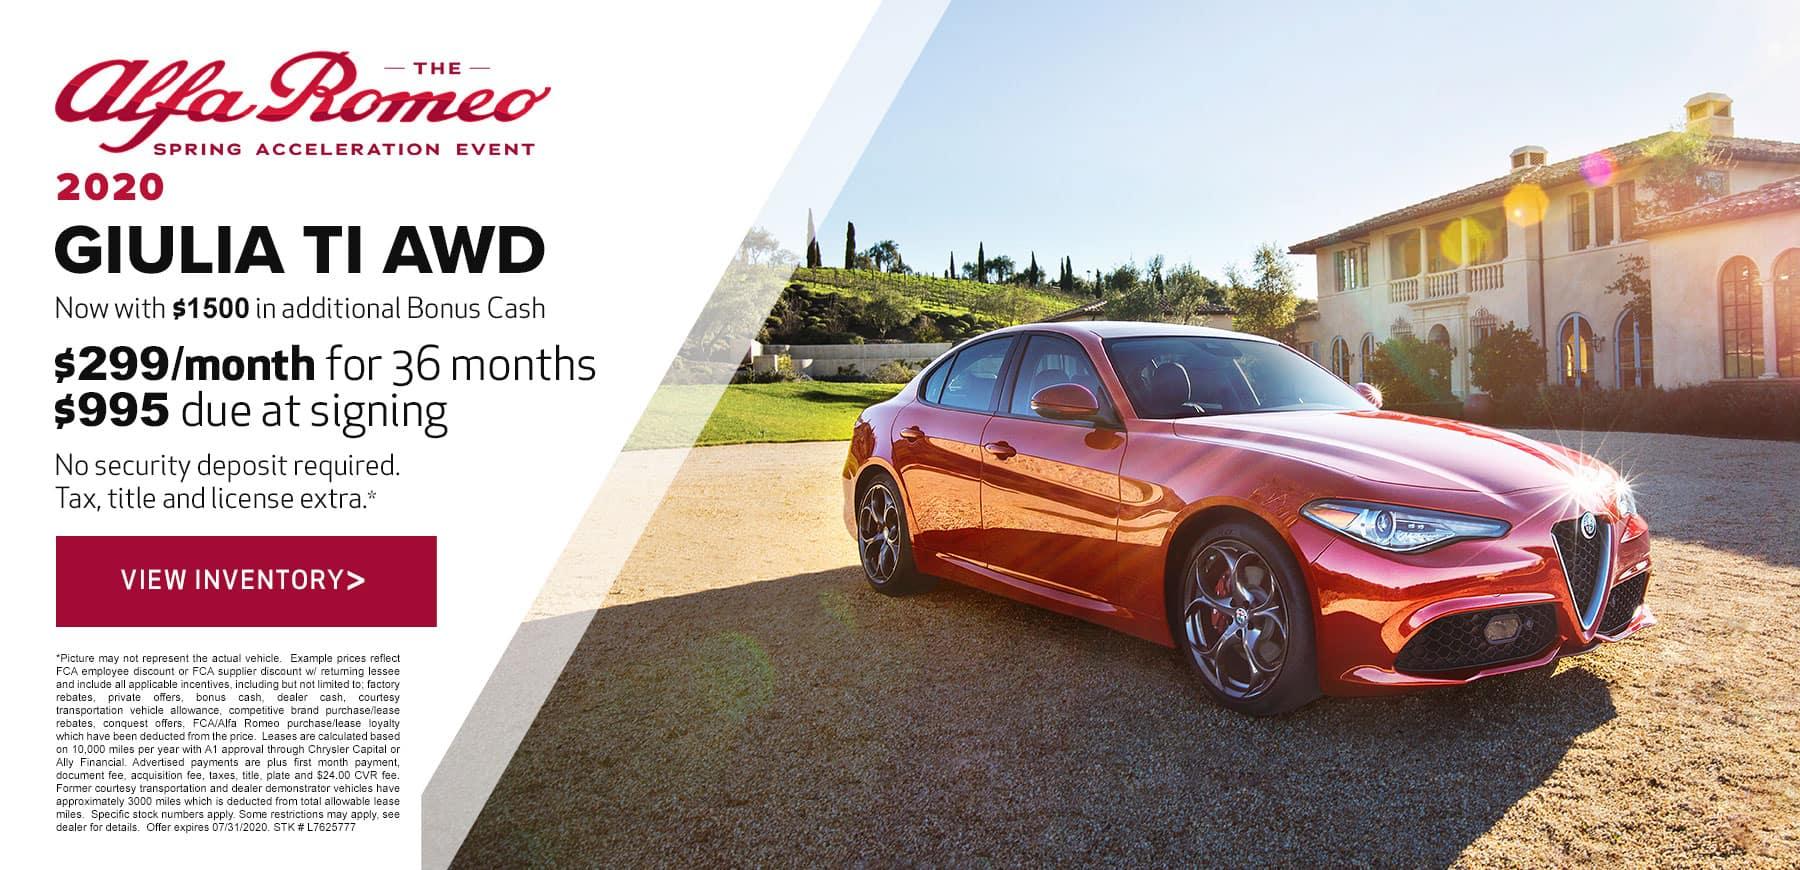 Genesis Alfa Romeo July 2020 Giulia Lease Offer